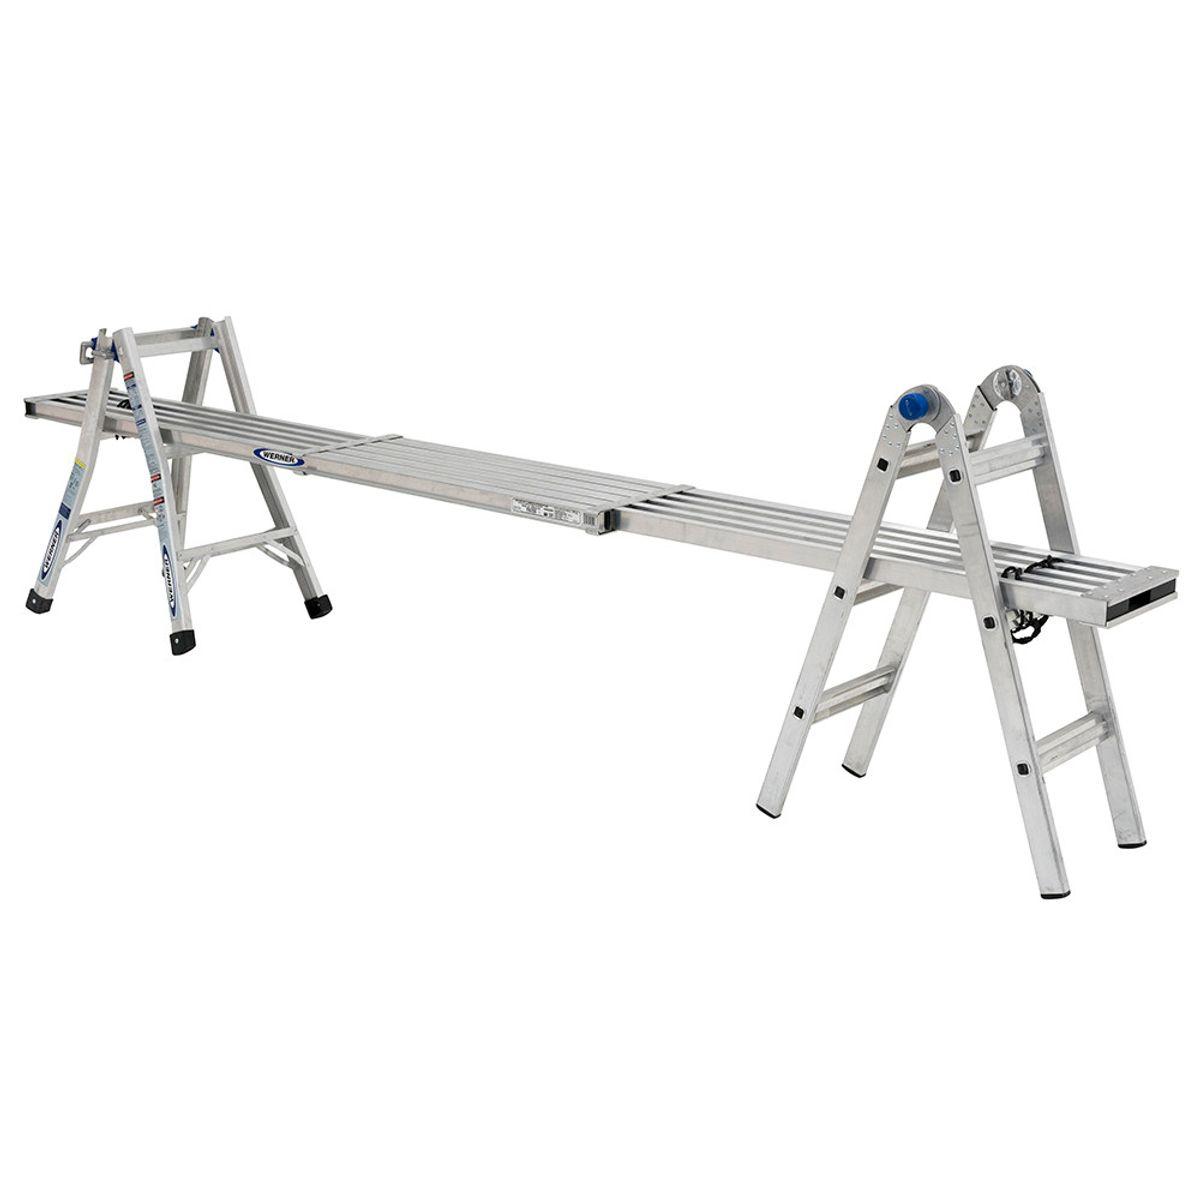 Mt 13 Multi Purpose Ladders Werner Us